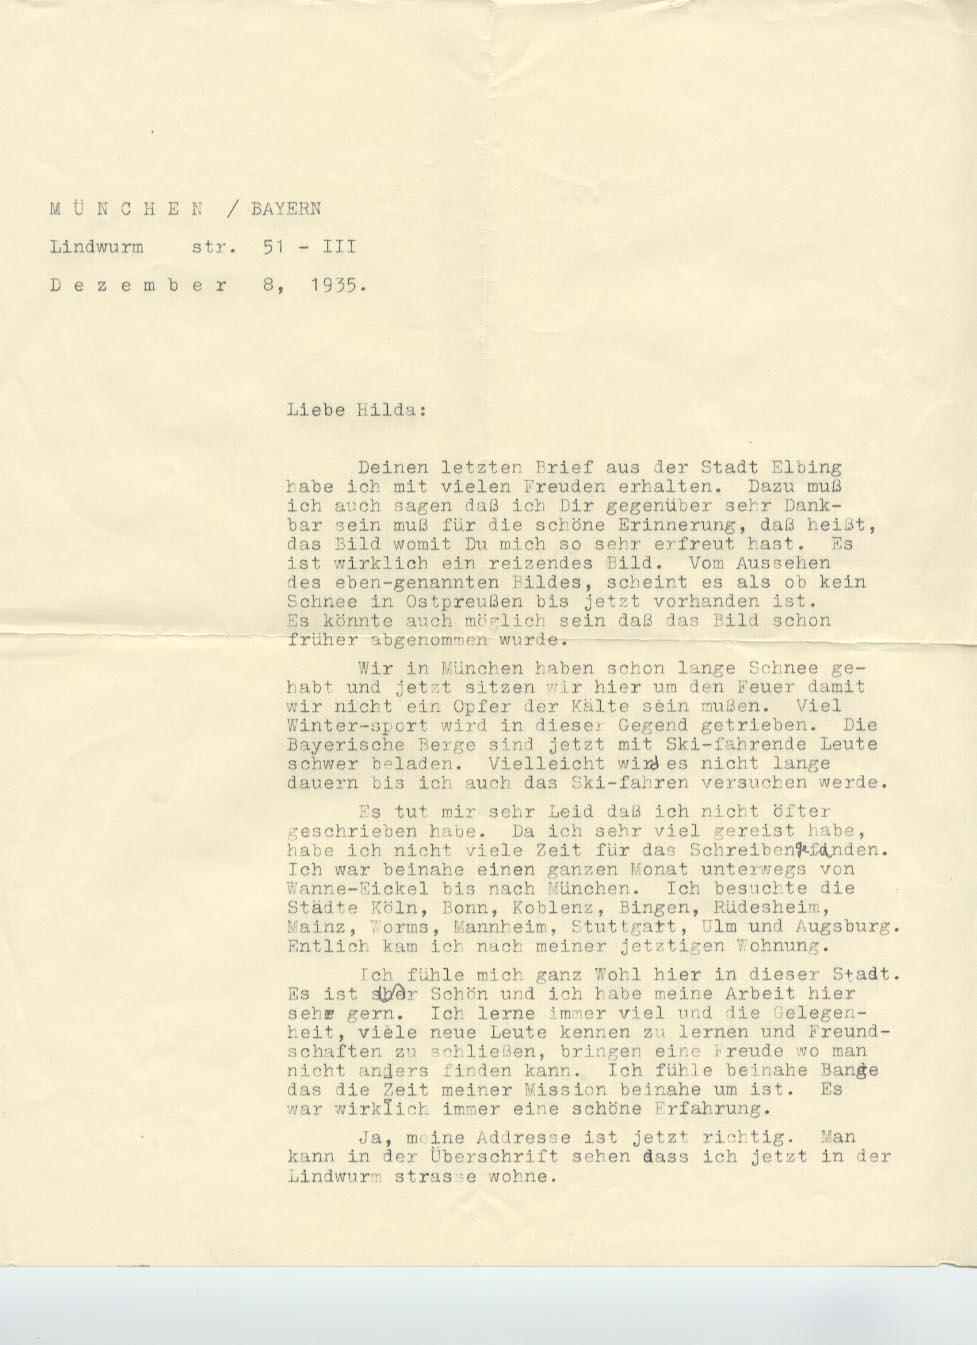 8 December 1935, p. 1